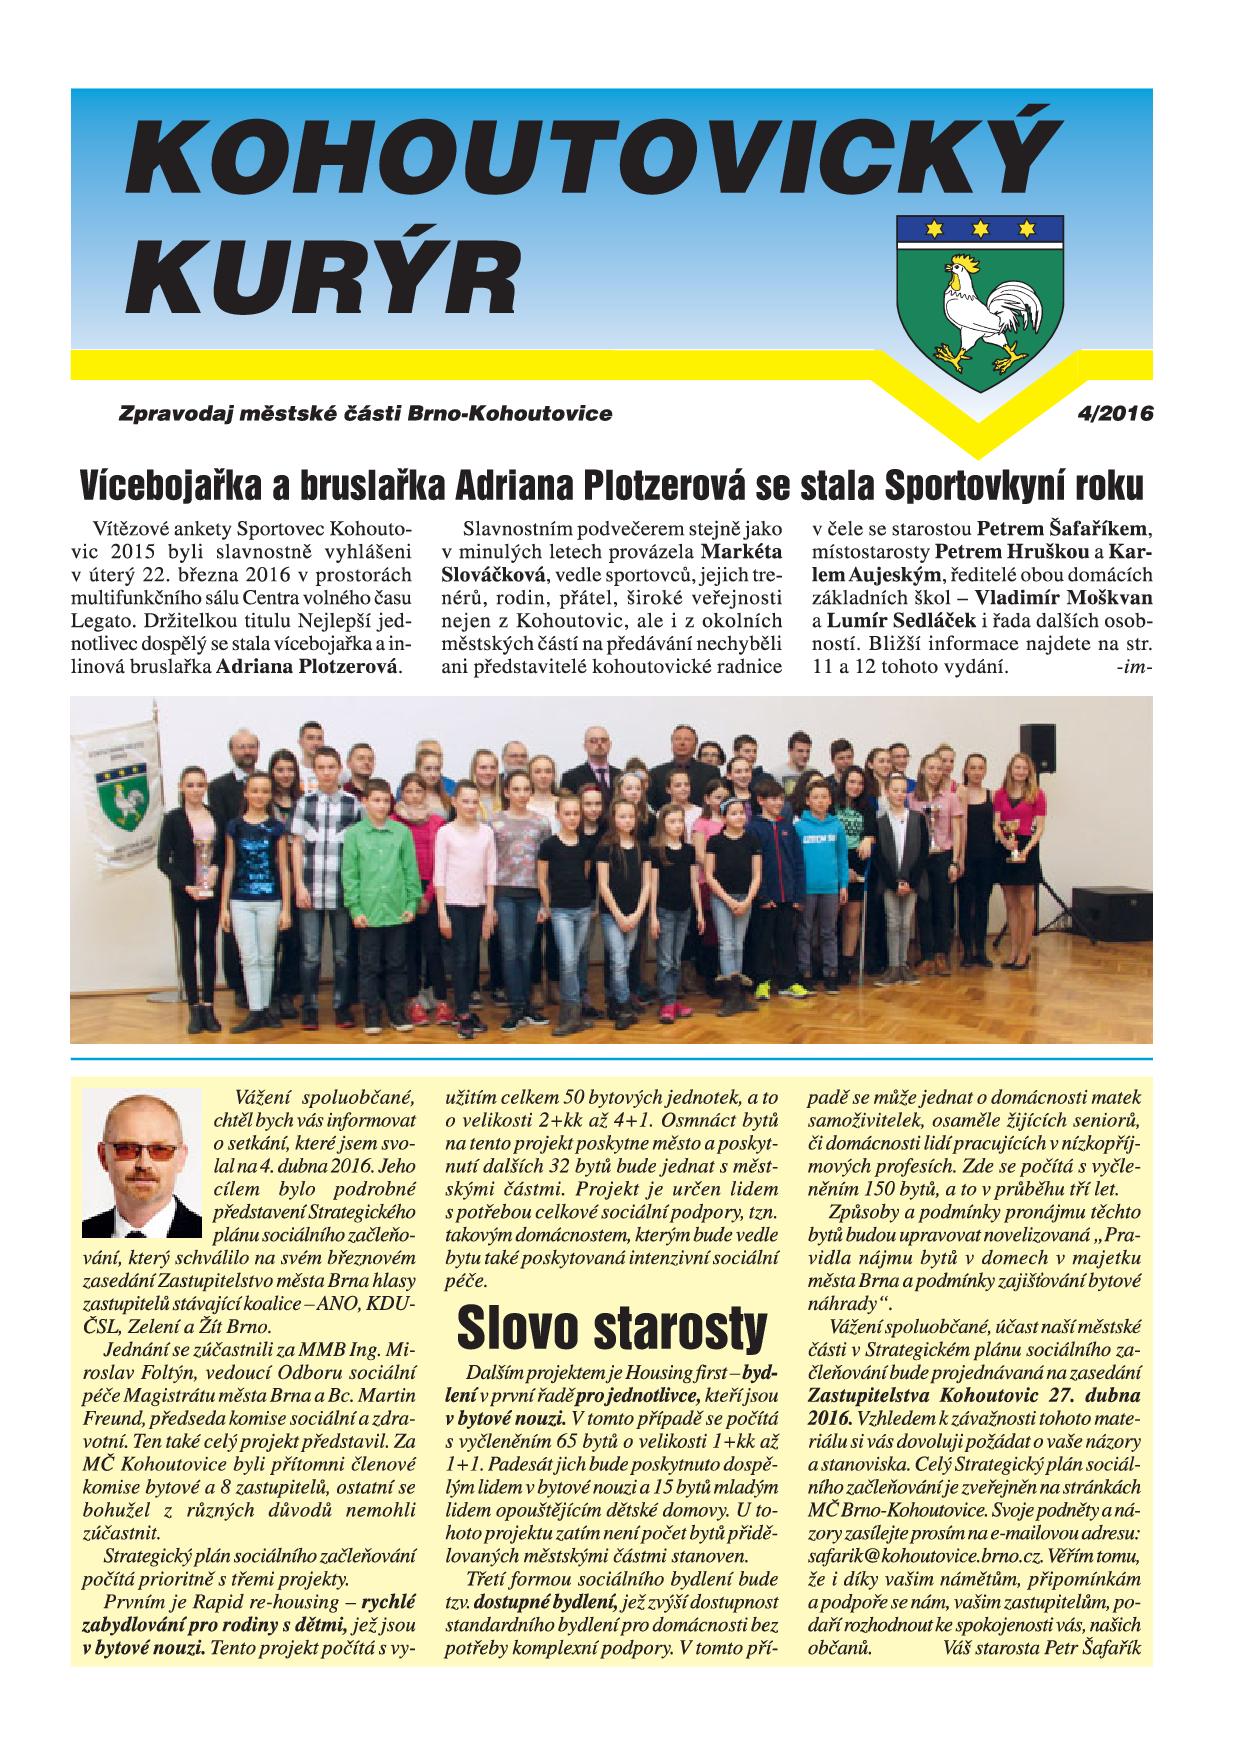 Kohoutovický-kurýr-duben-2016-01